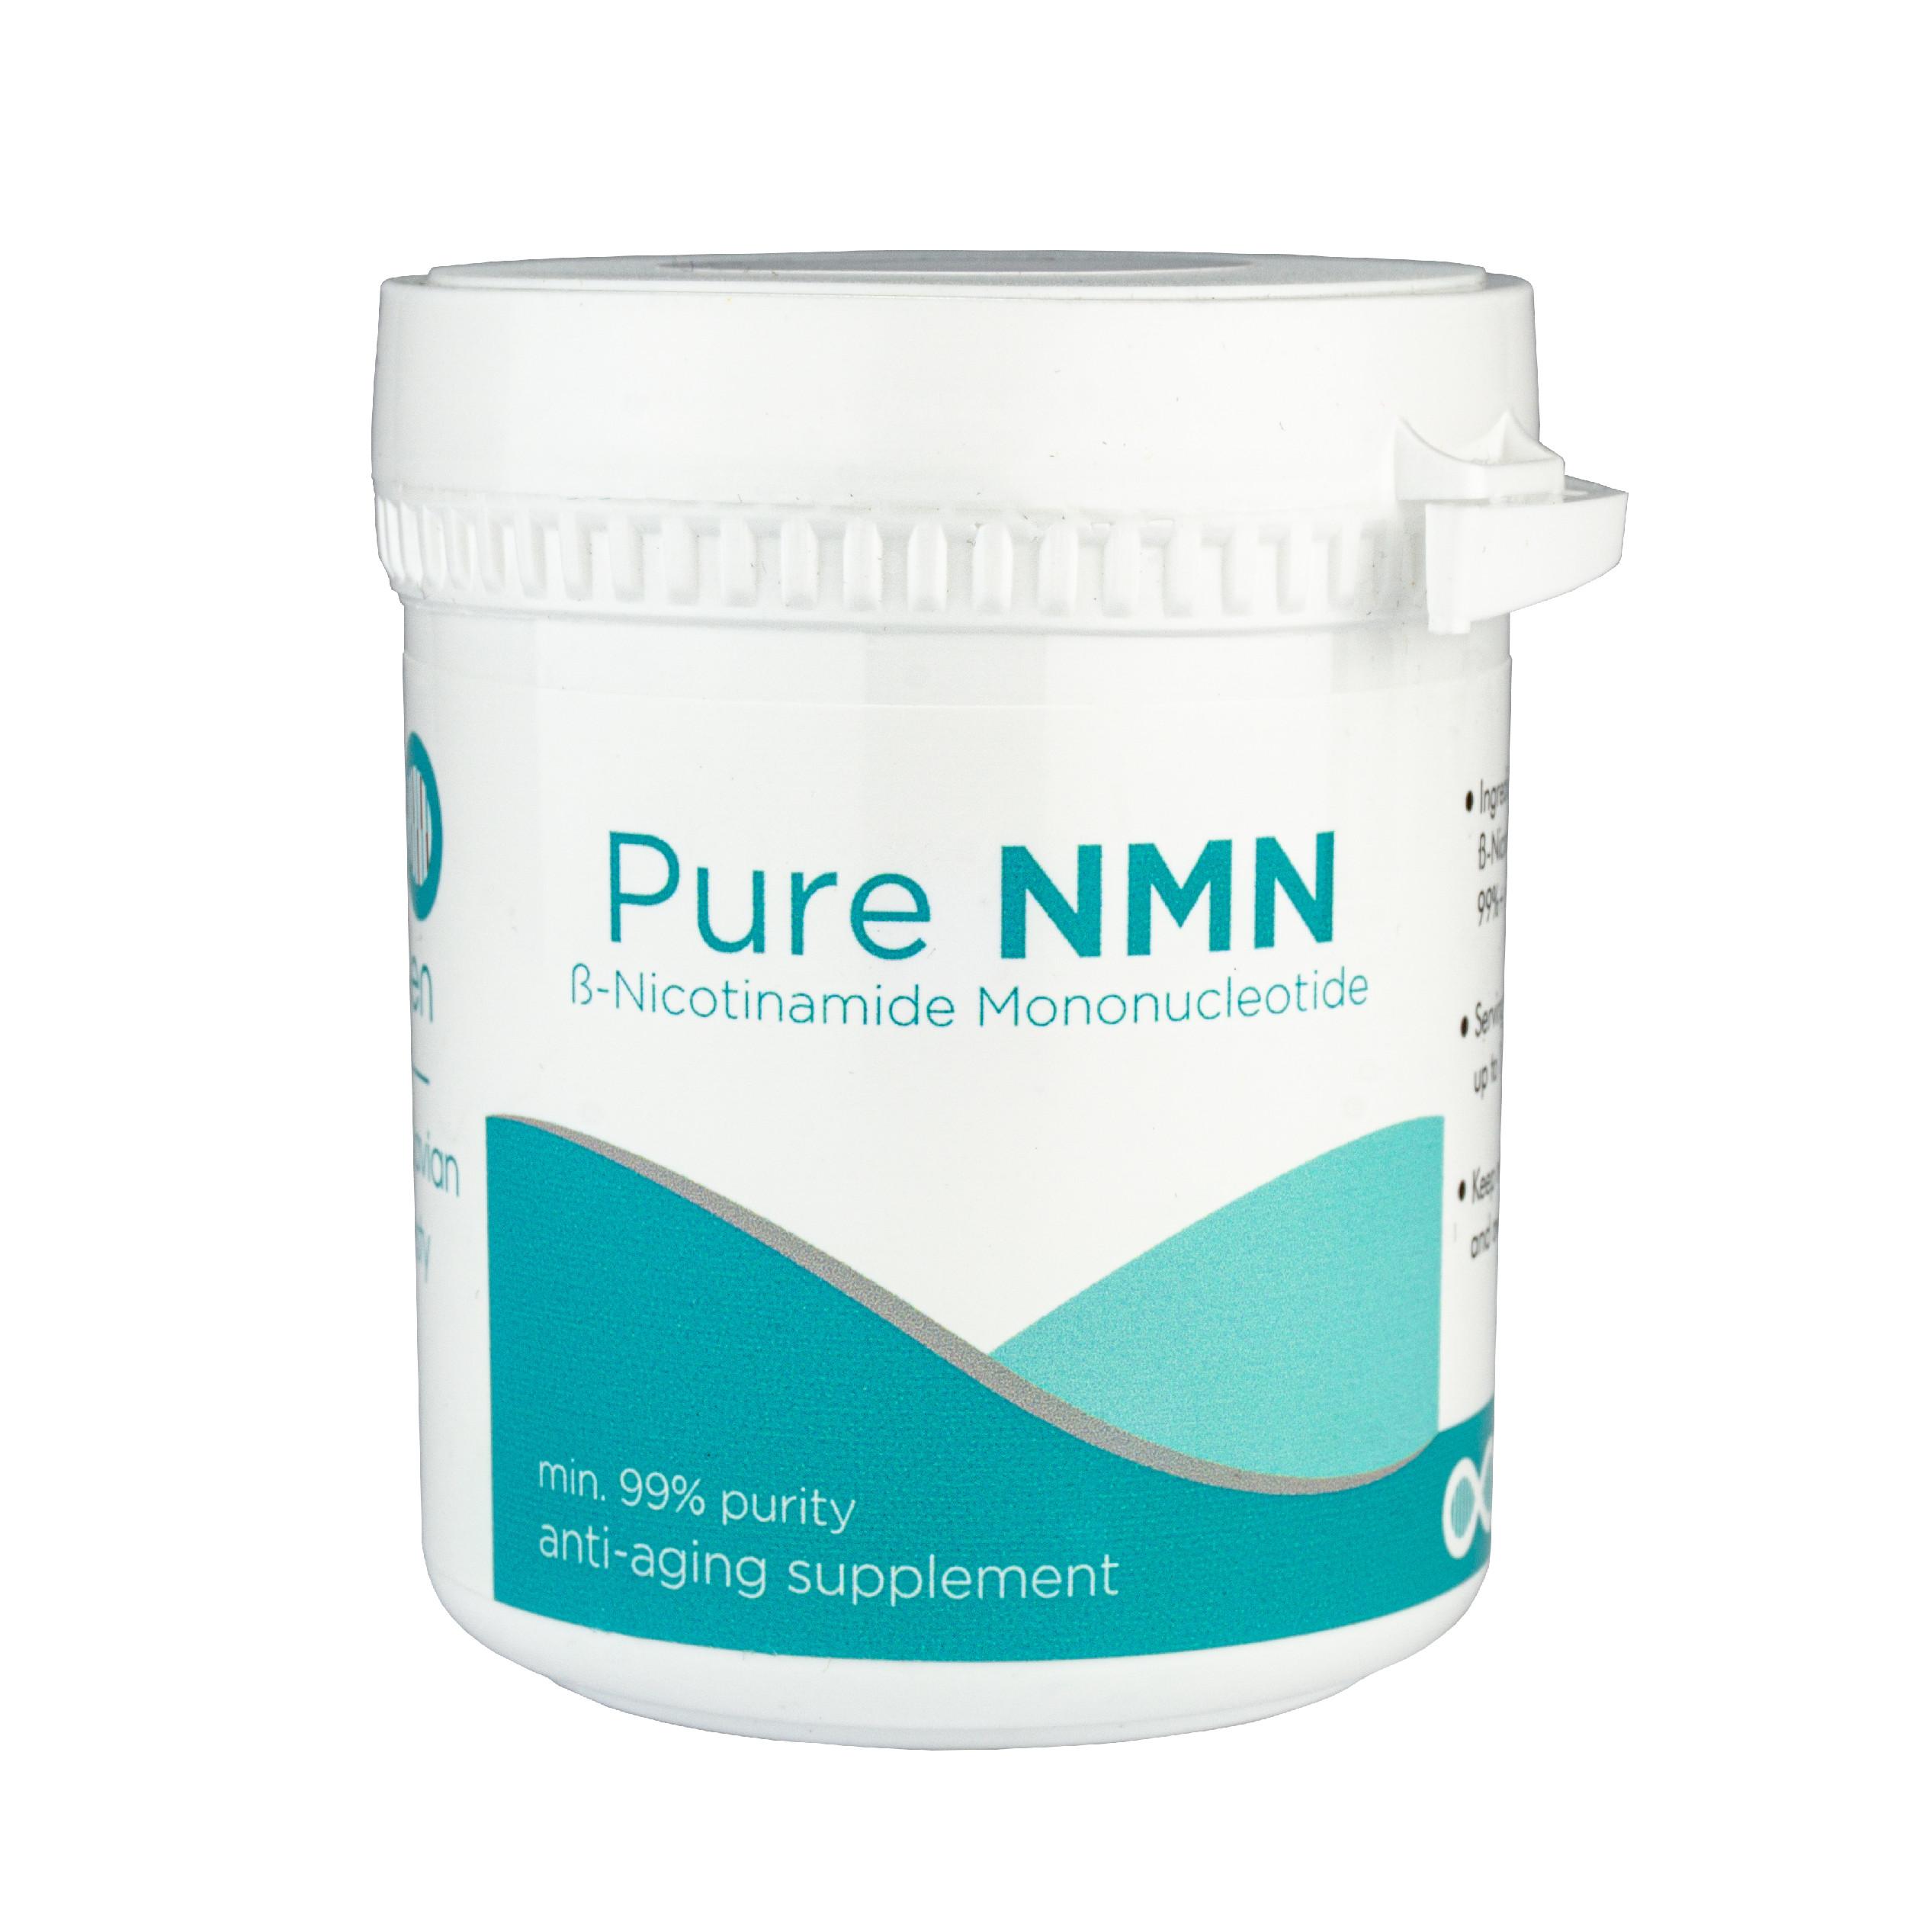 Hansen NMN (nikotinamid mononukleotid), prášek, 20g